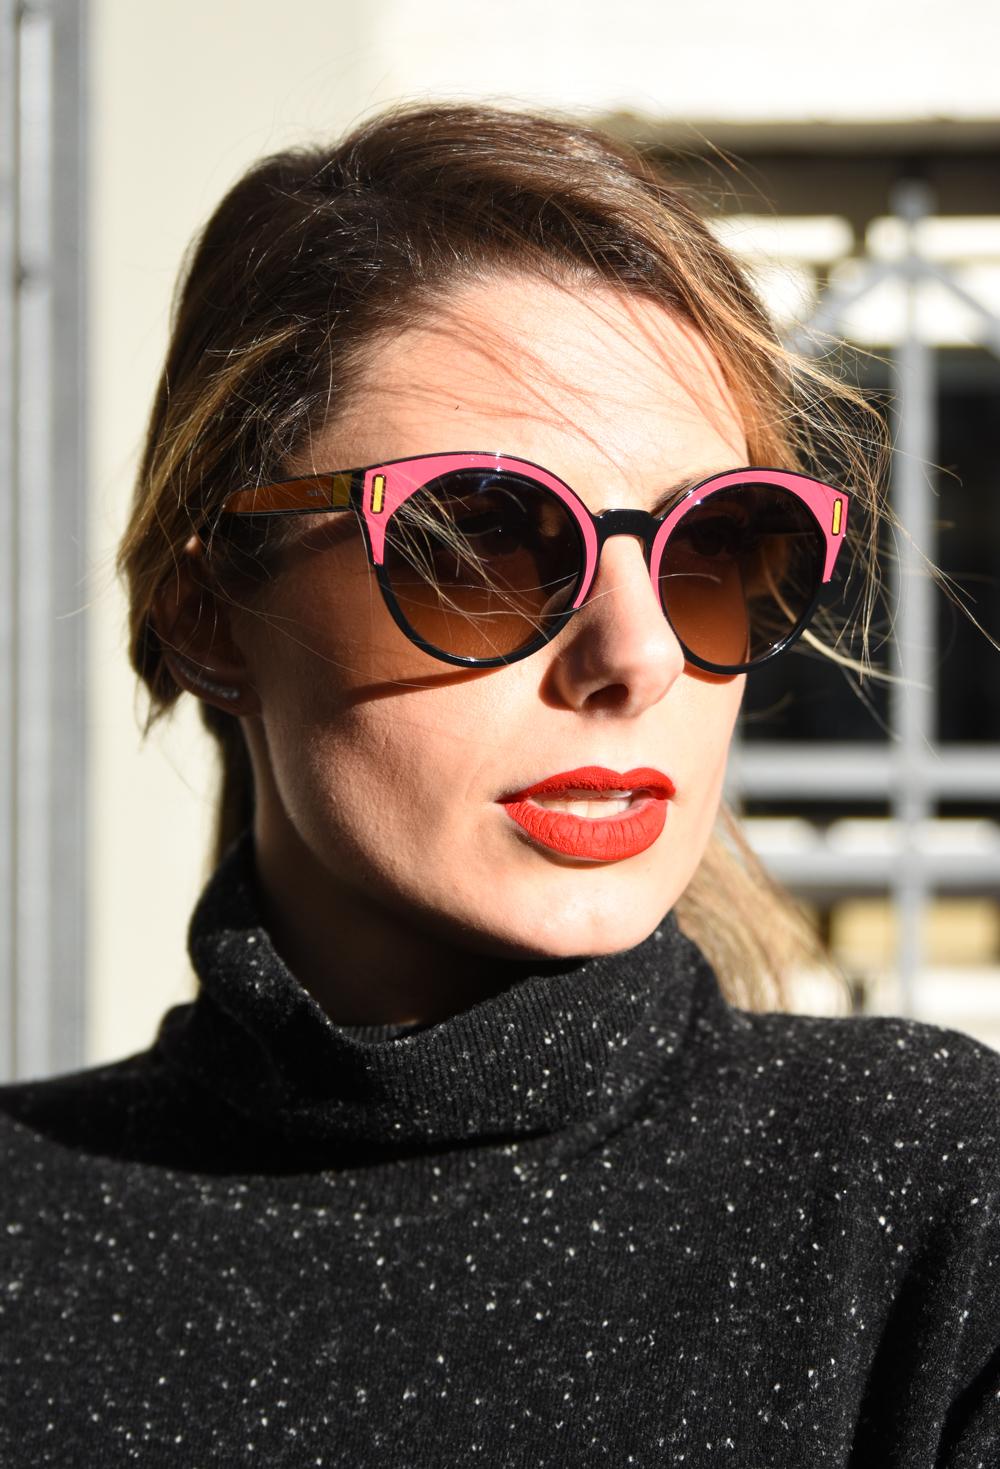 eddb96c5a913 Latest Prada Sunglasses 2017